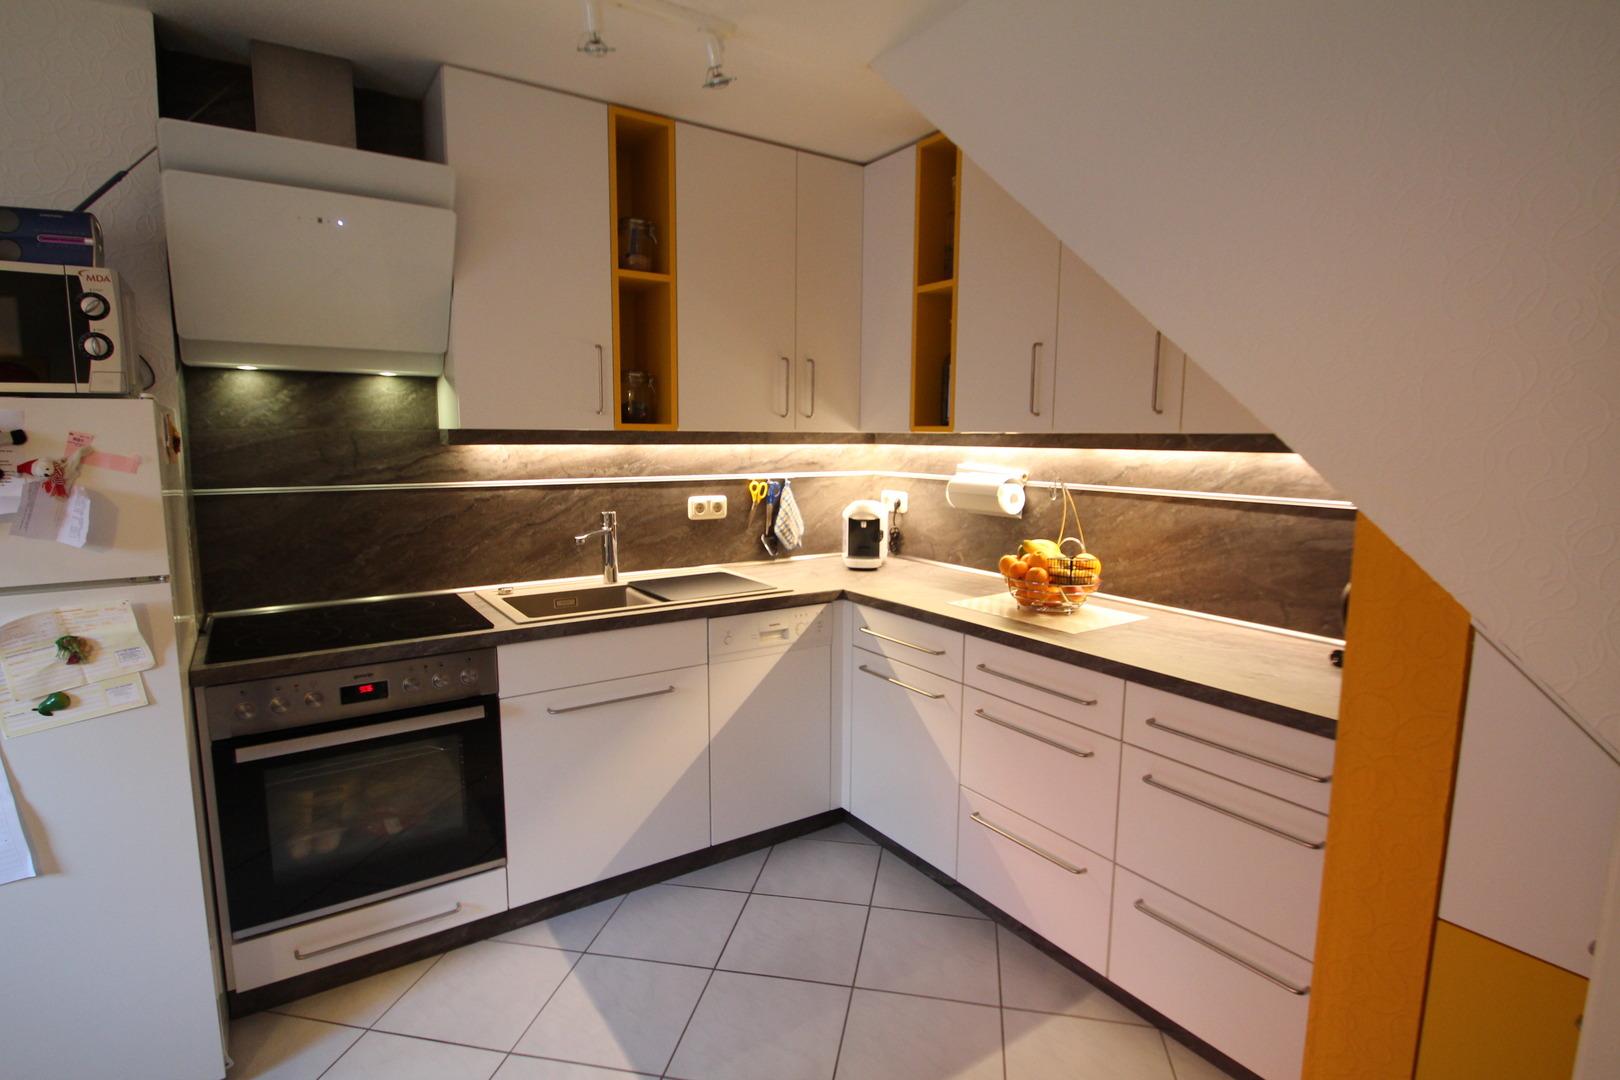 Küche In Dachschräge Gallery - Milbank.us - milbank.us